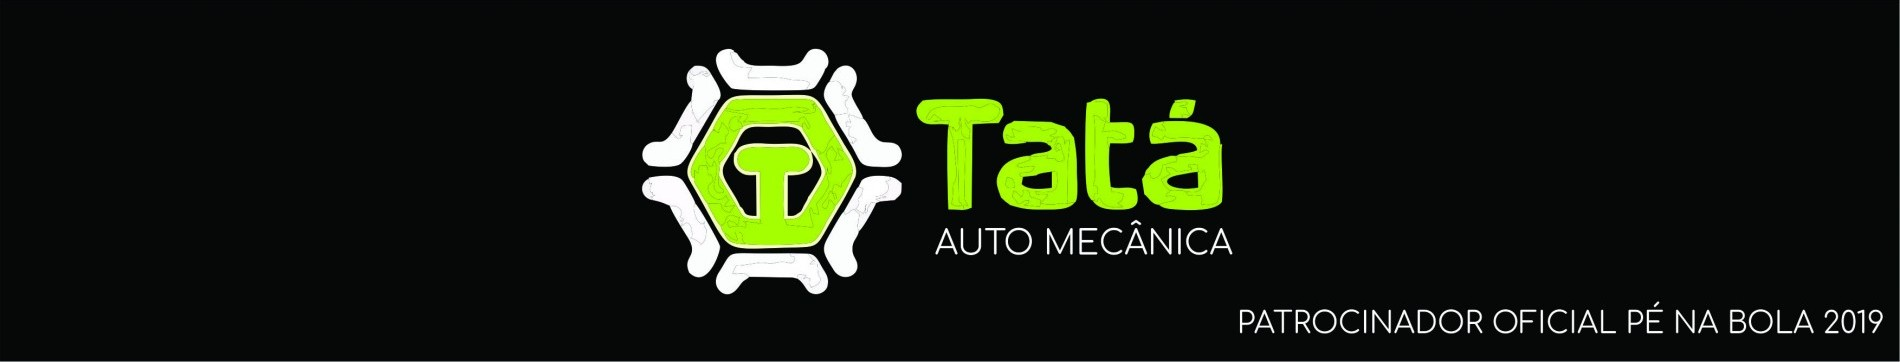 uploads/multimidia/20190621024917-mecanica-tata.jpg